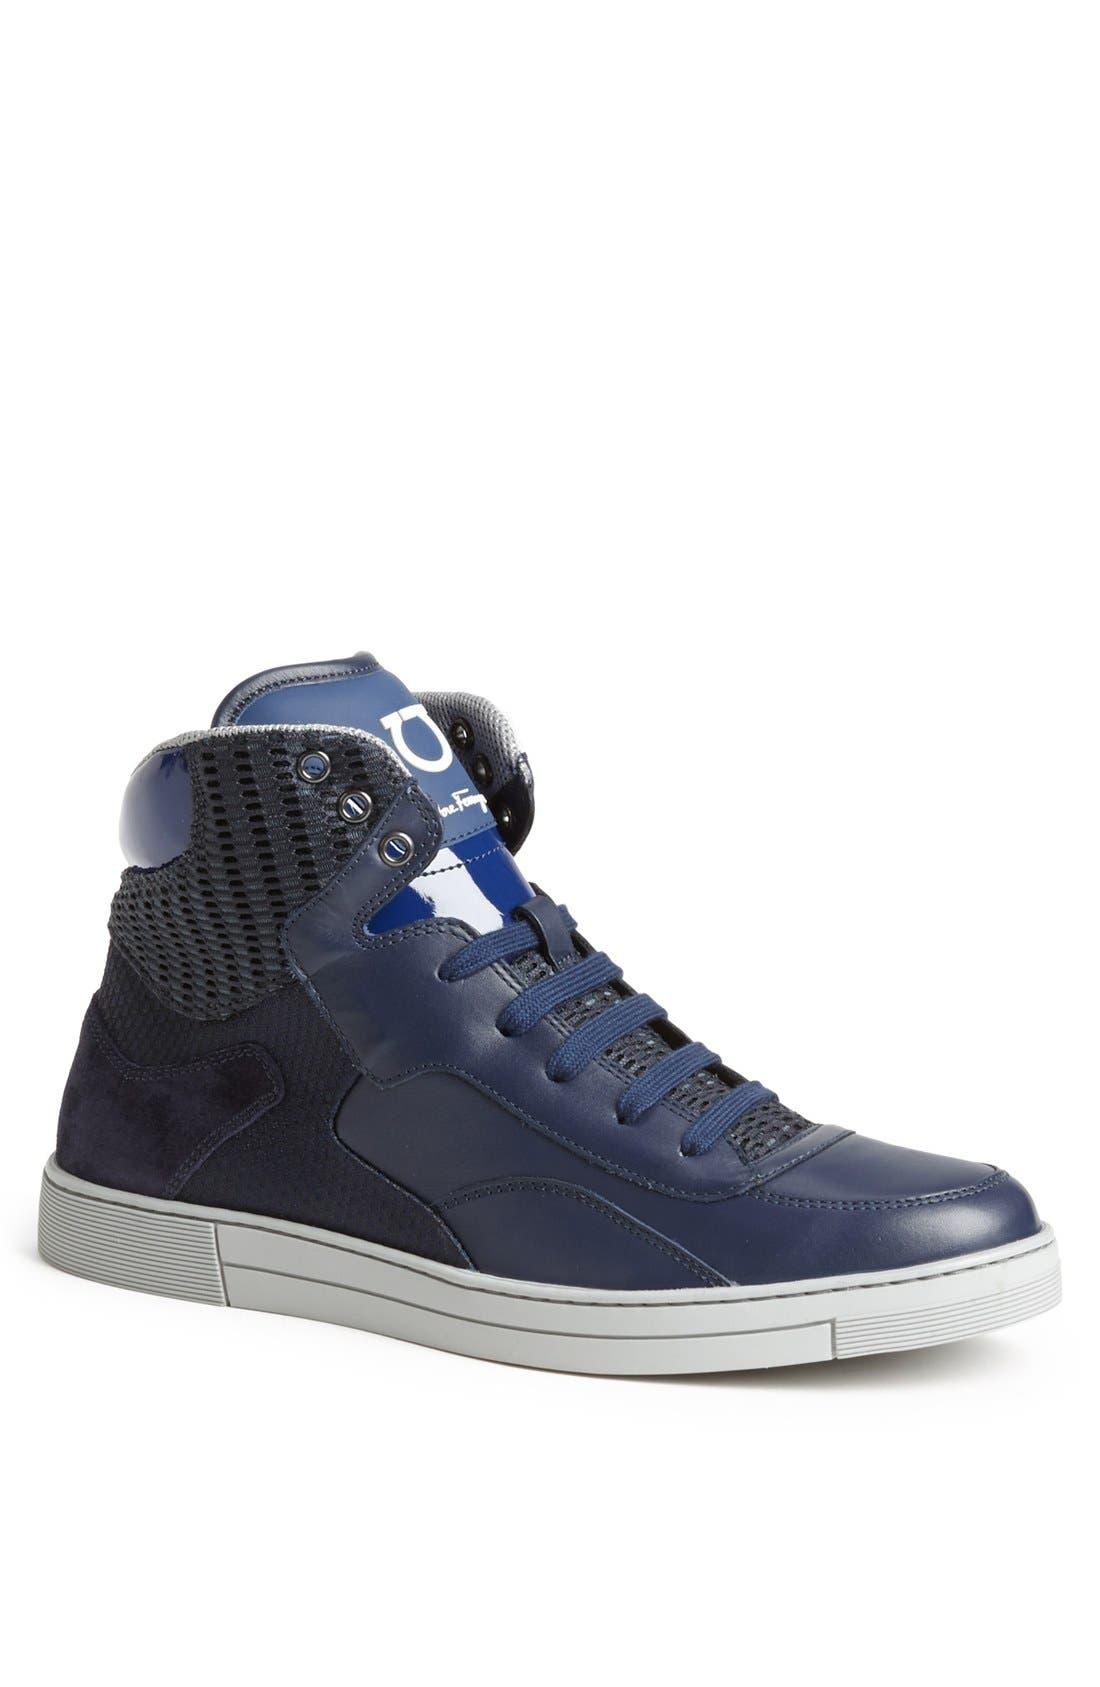 Main Image - Salvatore Ferragamo 'Robert' High Top Sneaker